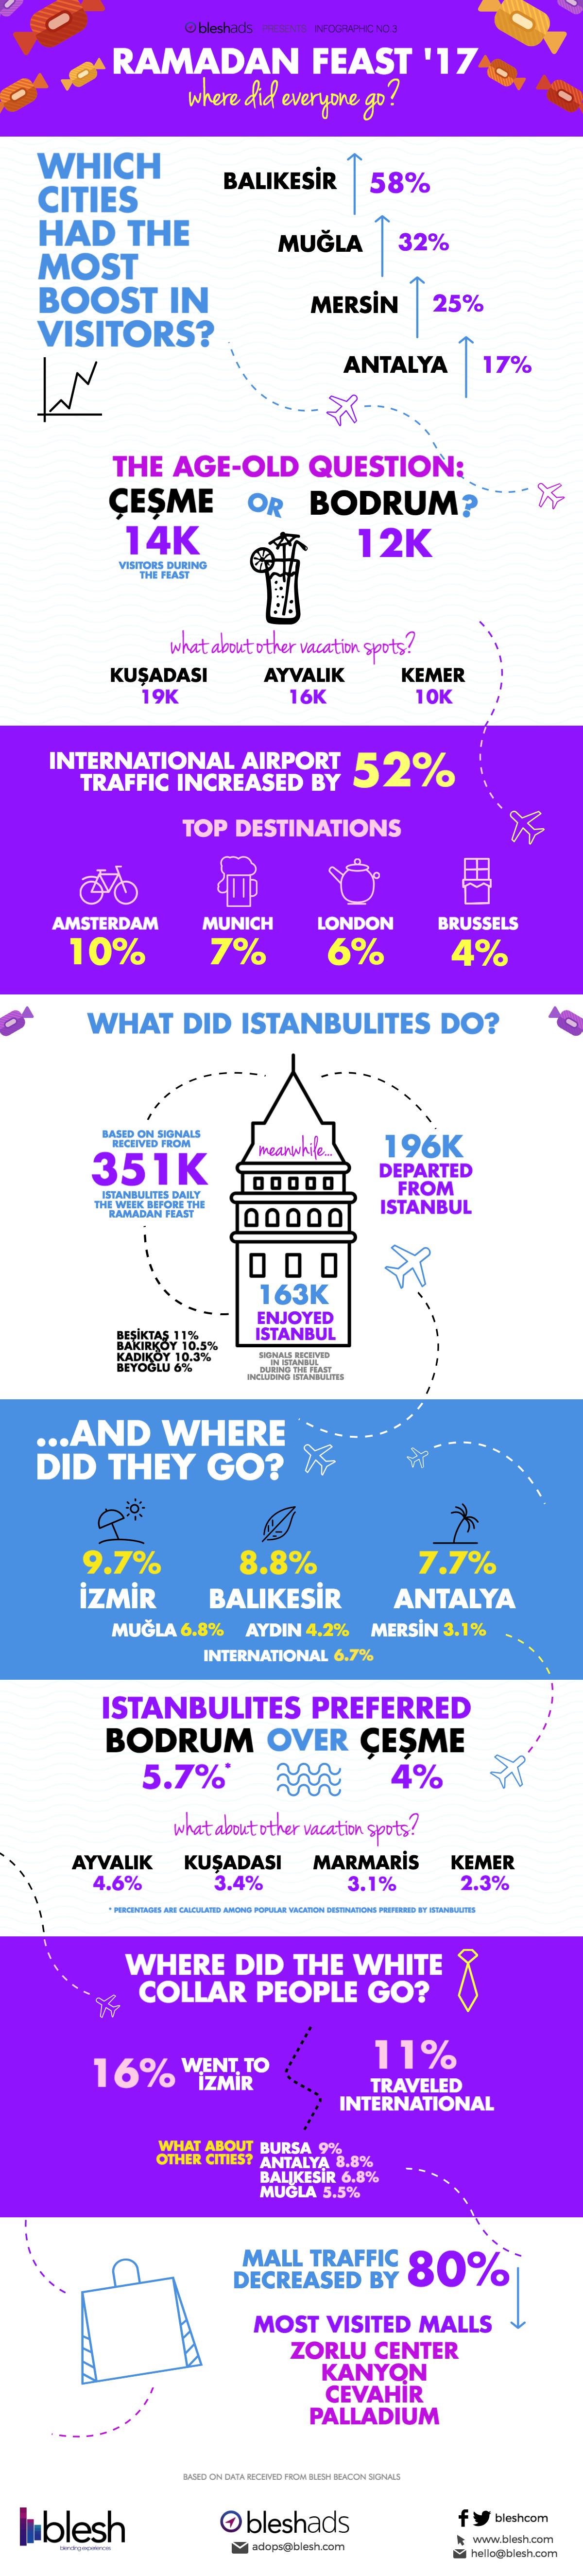 ramadan-feast-infographic